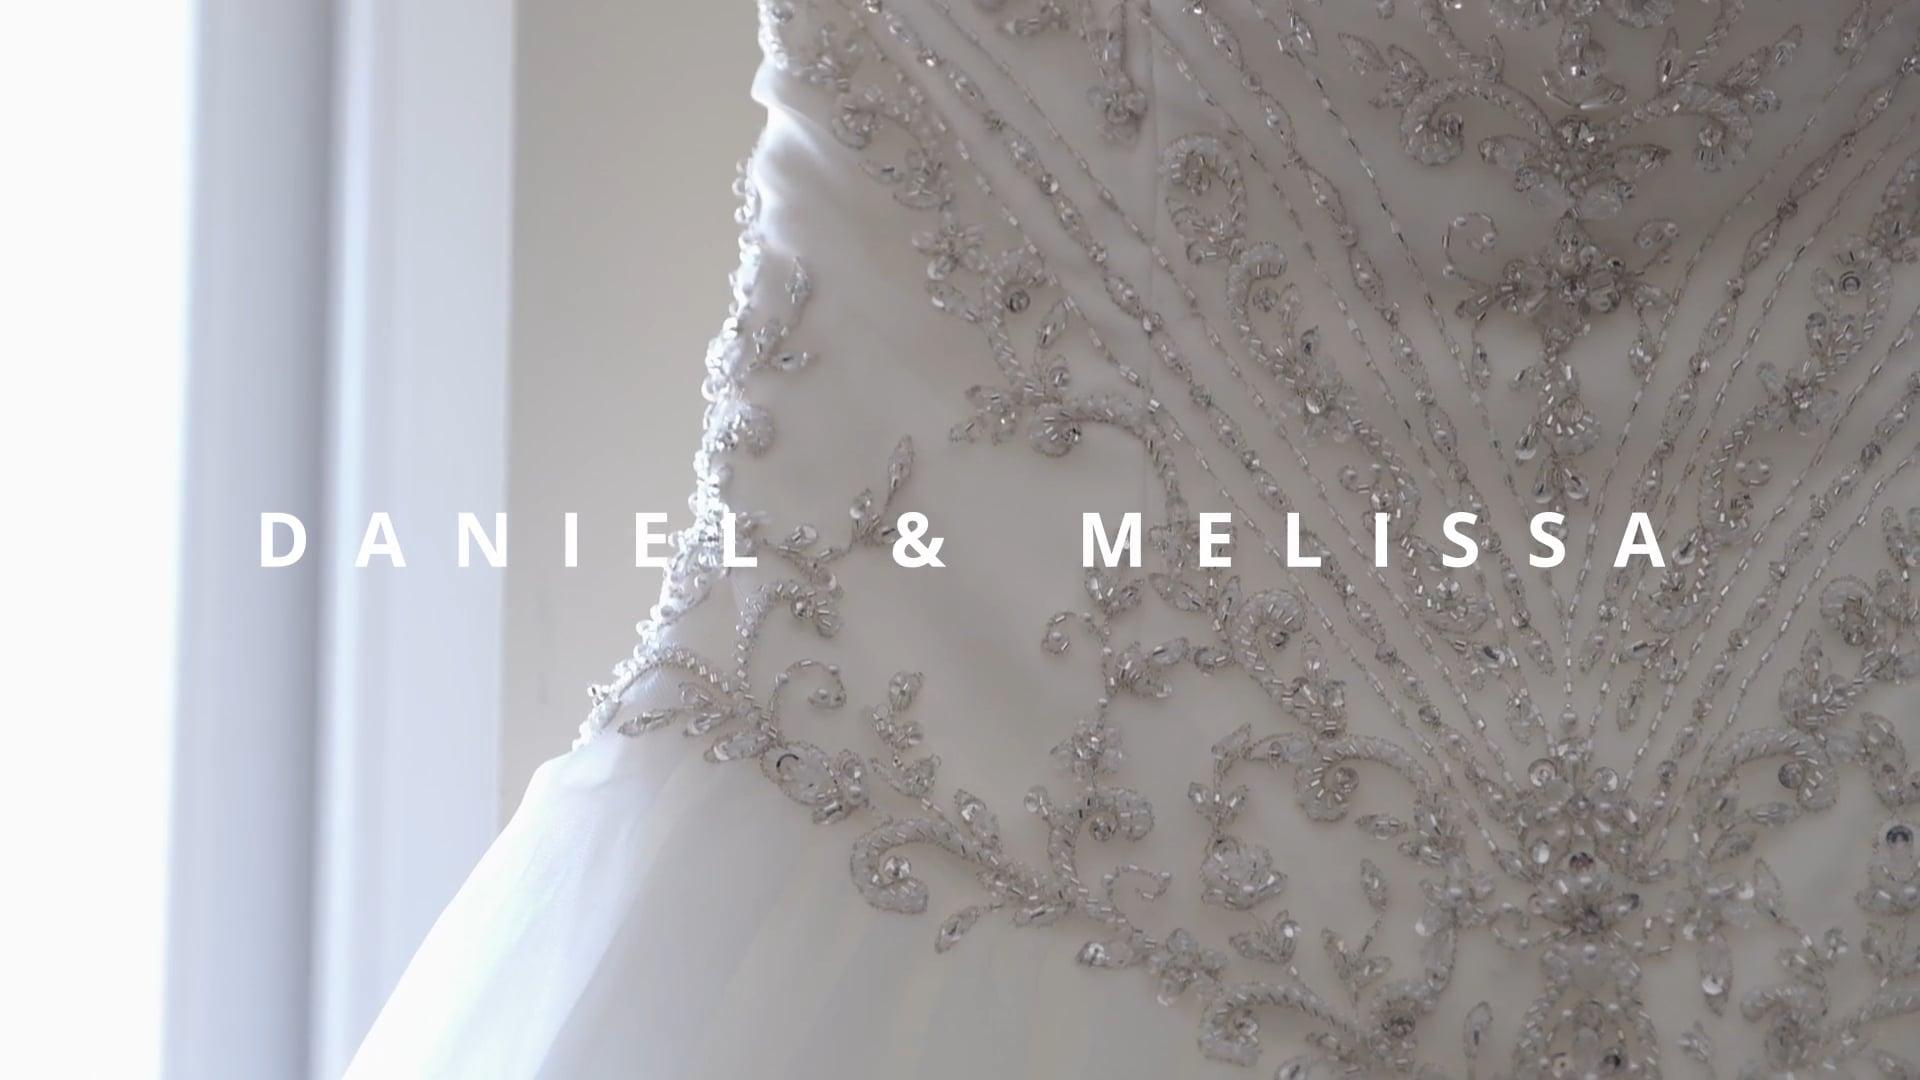 Daniel & Melissa